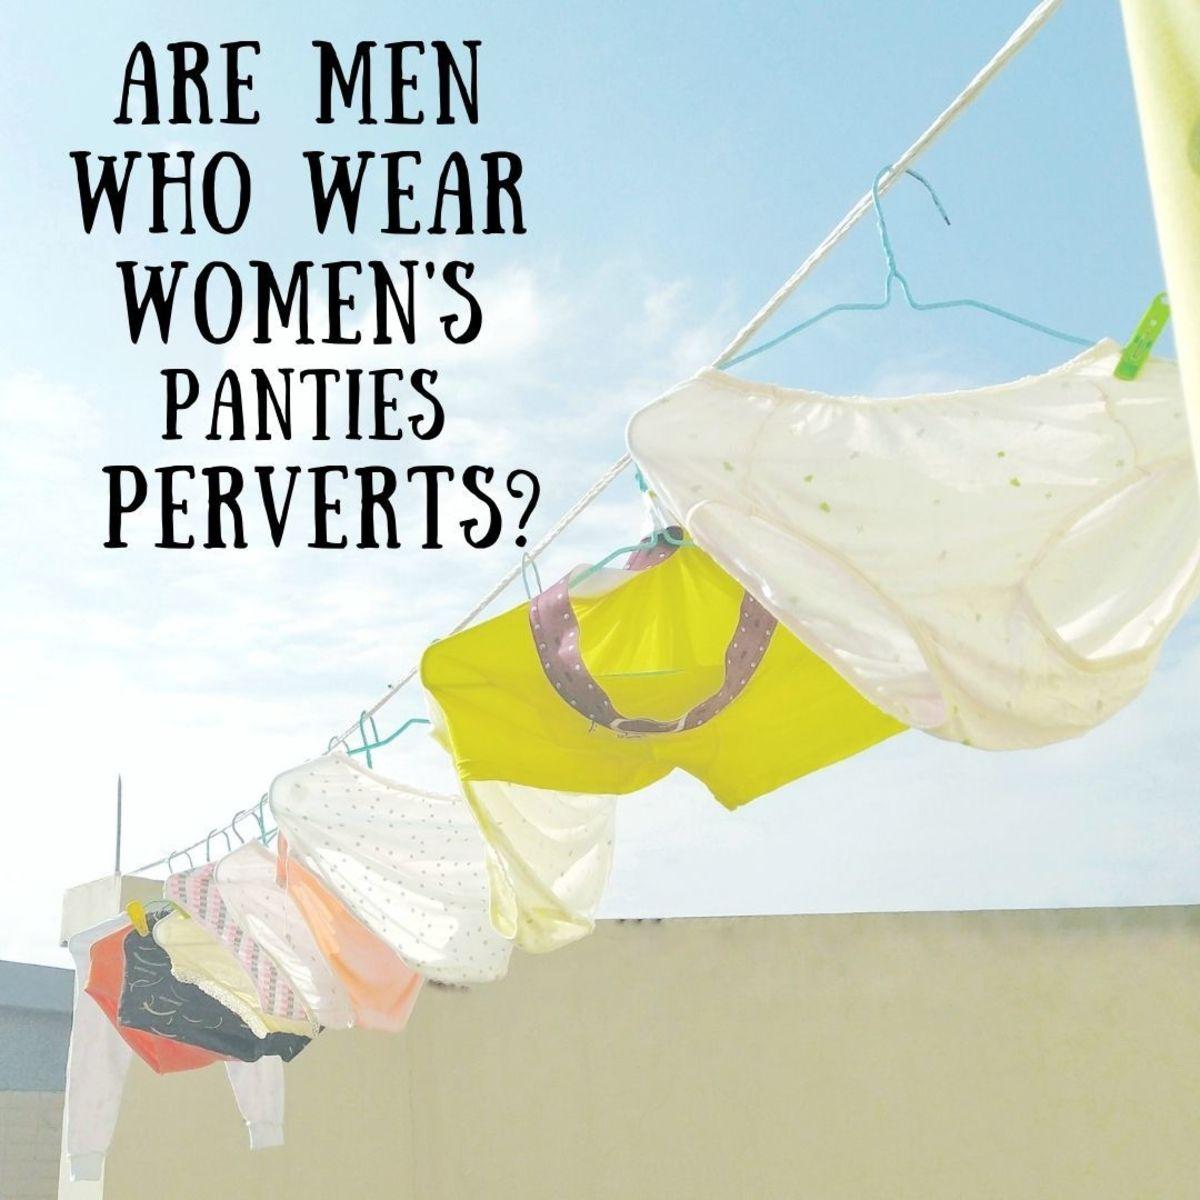 Does wearing women's lingerie make men perverts?